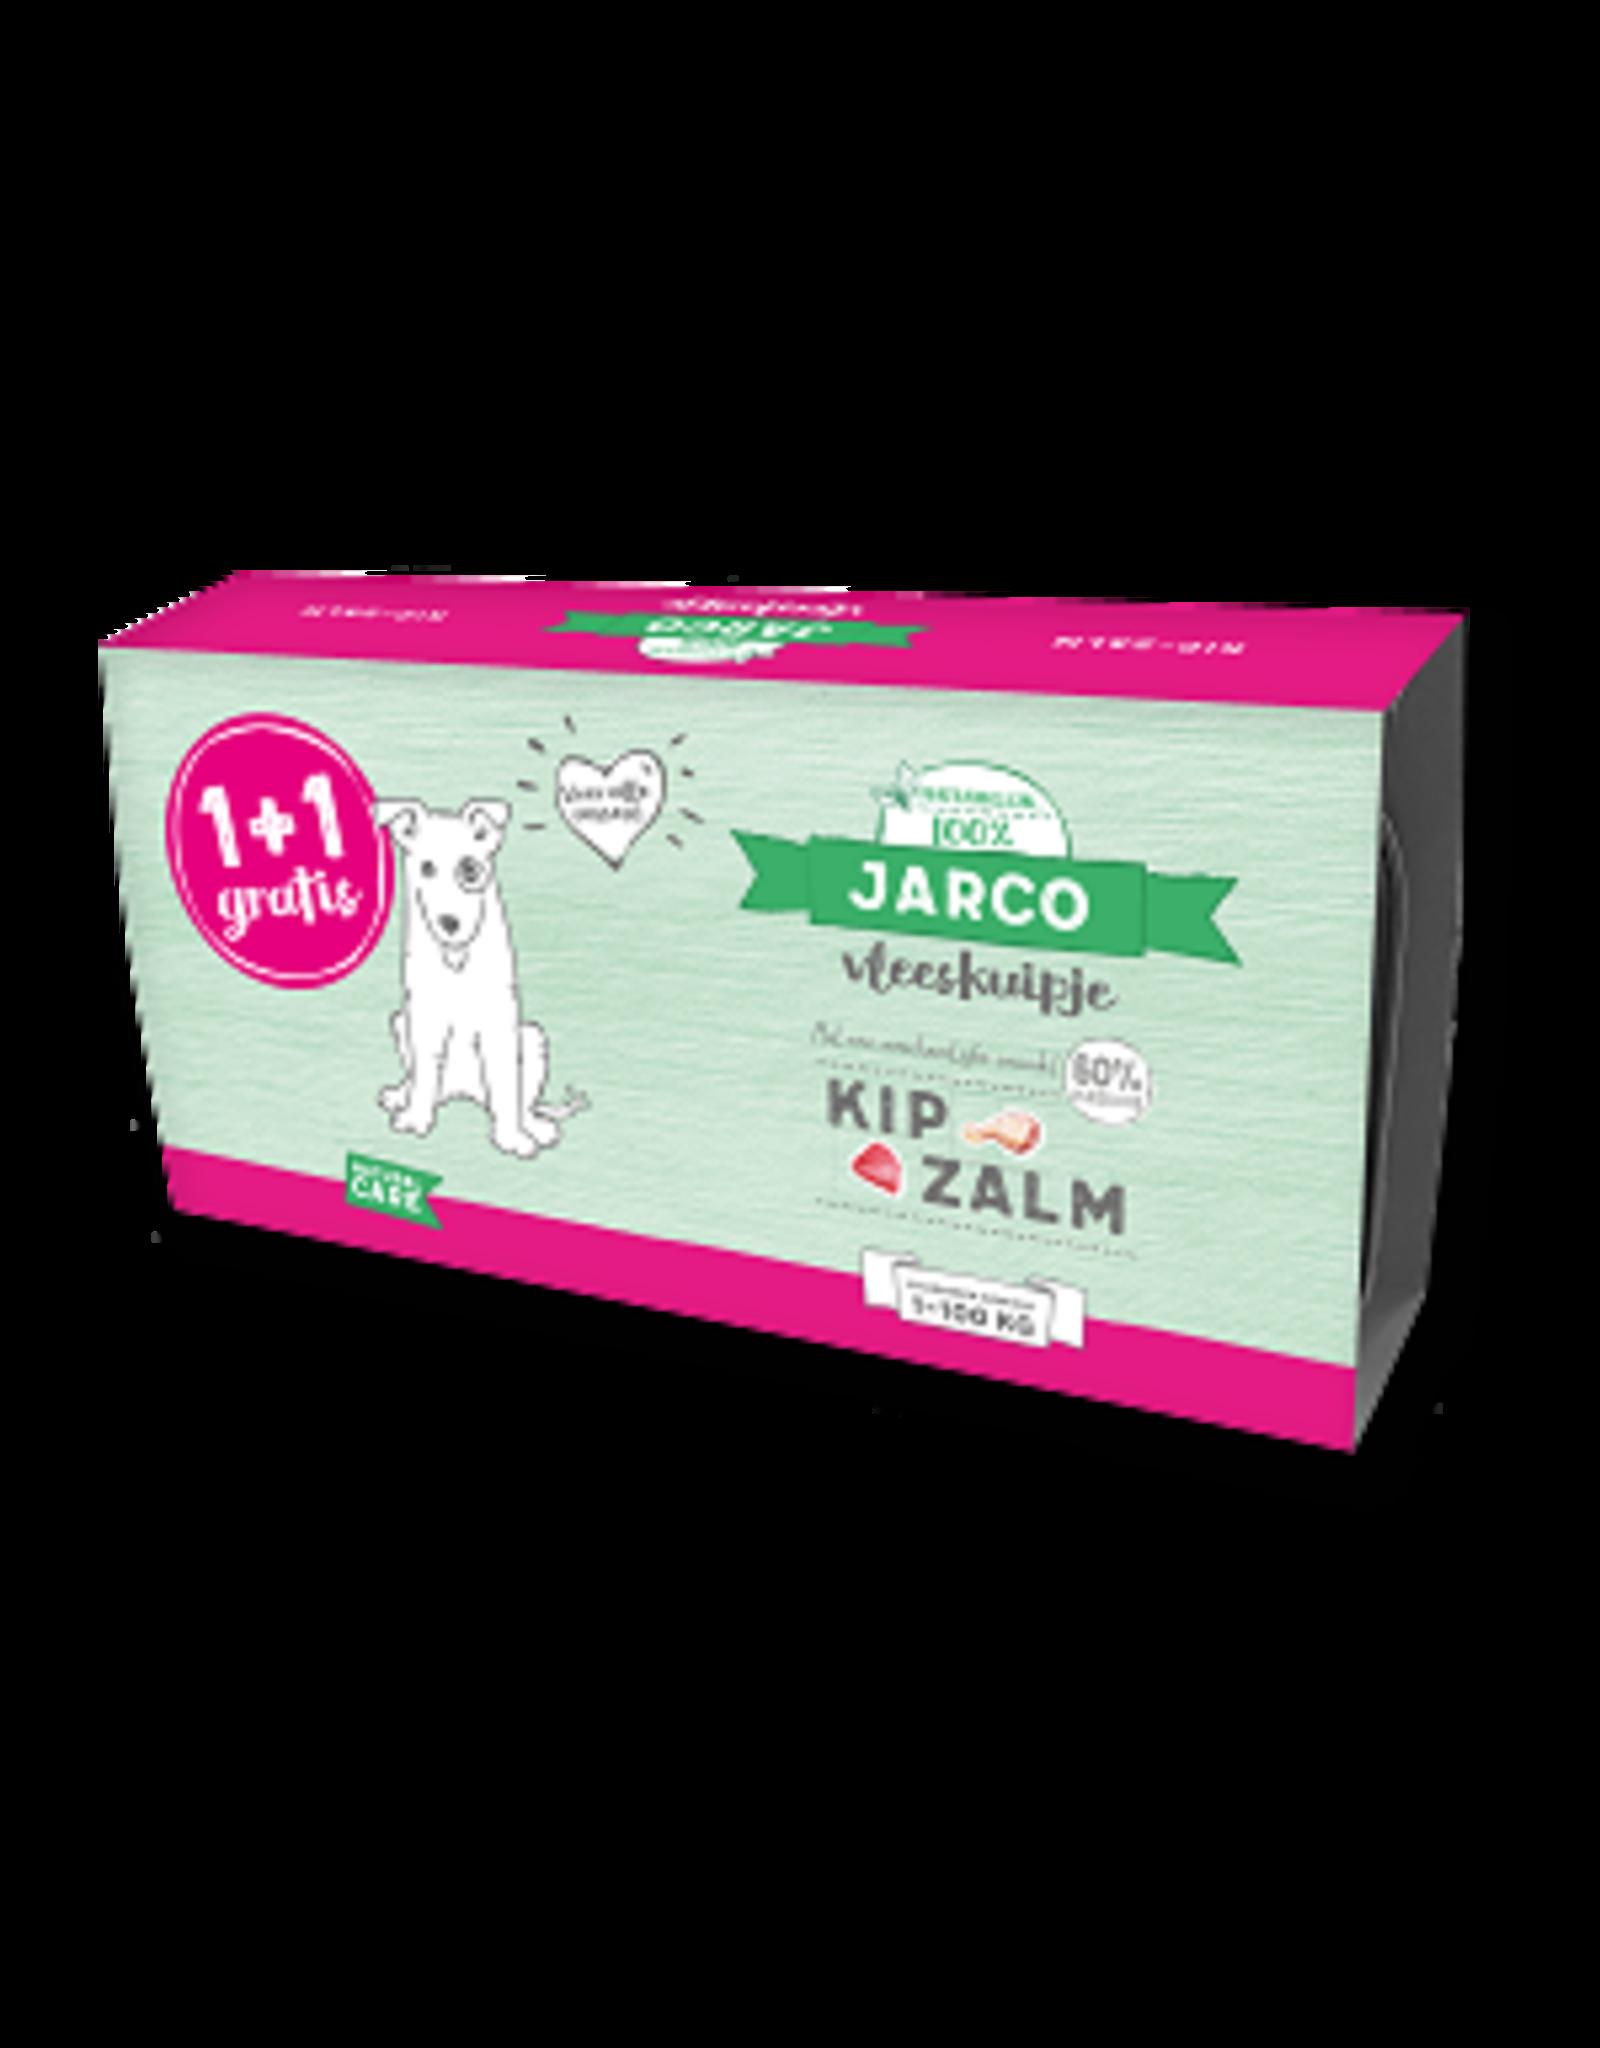 Jarco vleeskuipje Kip Zalm